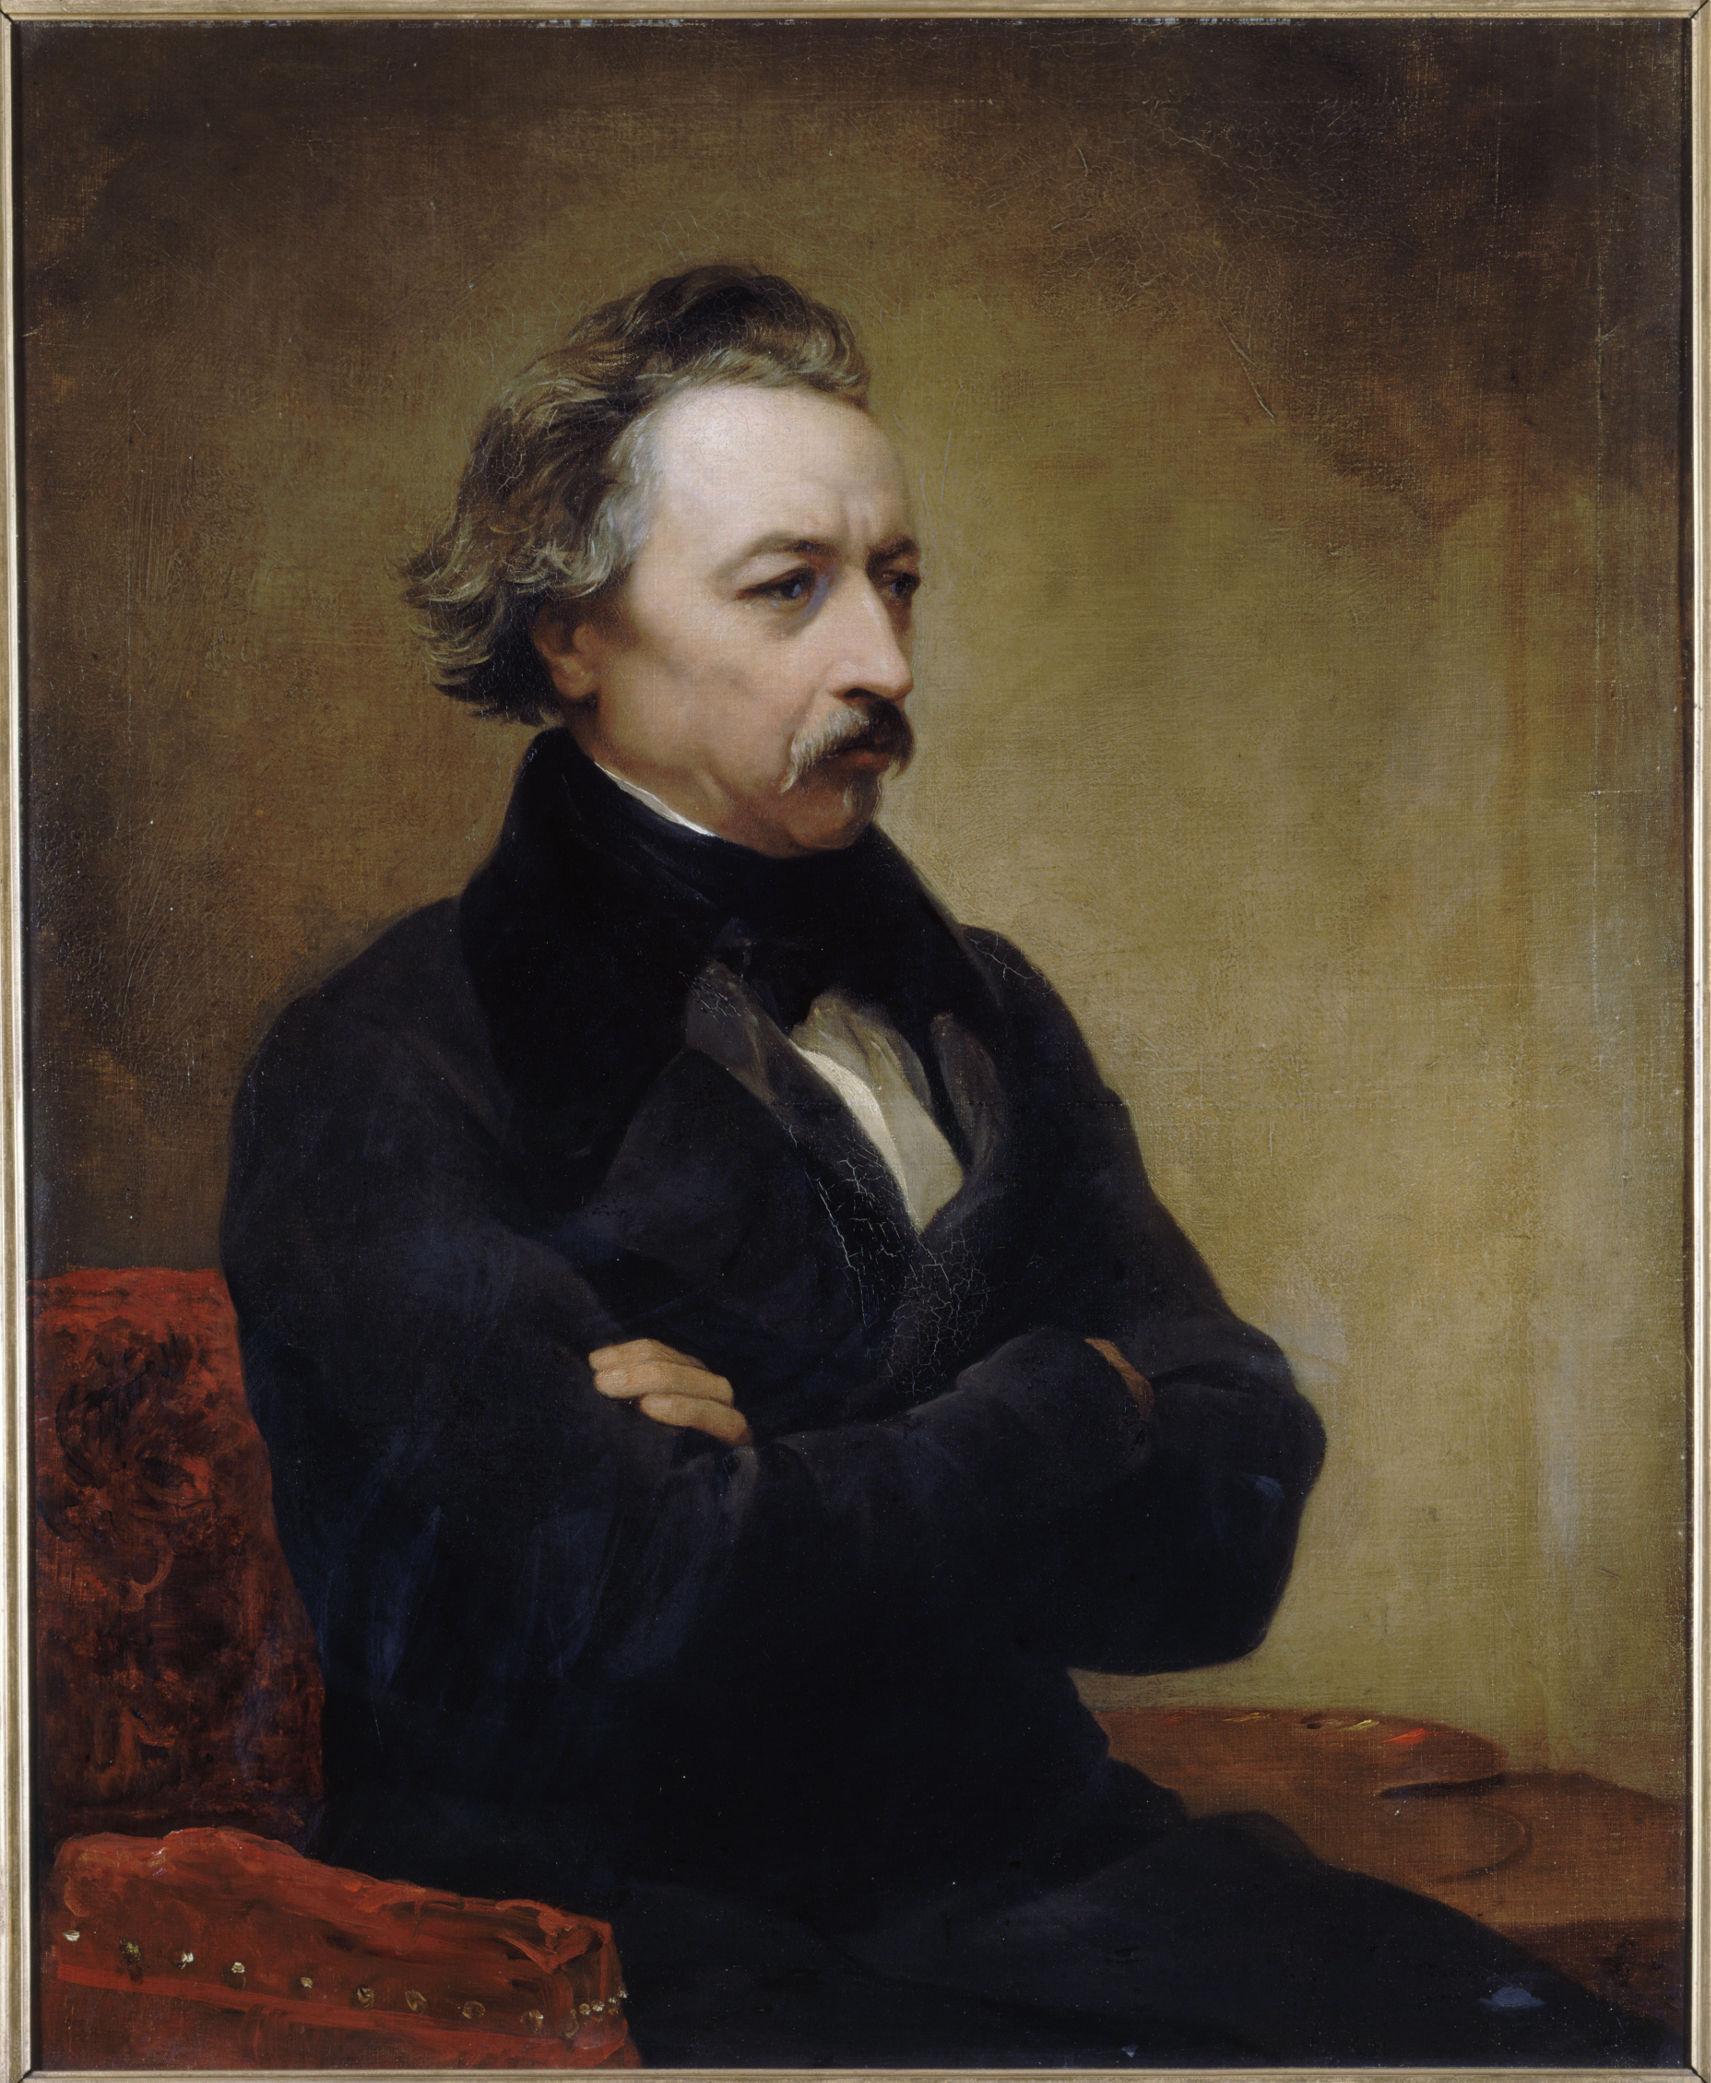 Thomas Phillips (1770-1845).